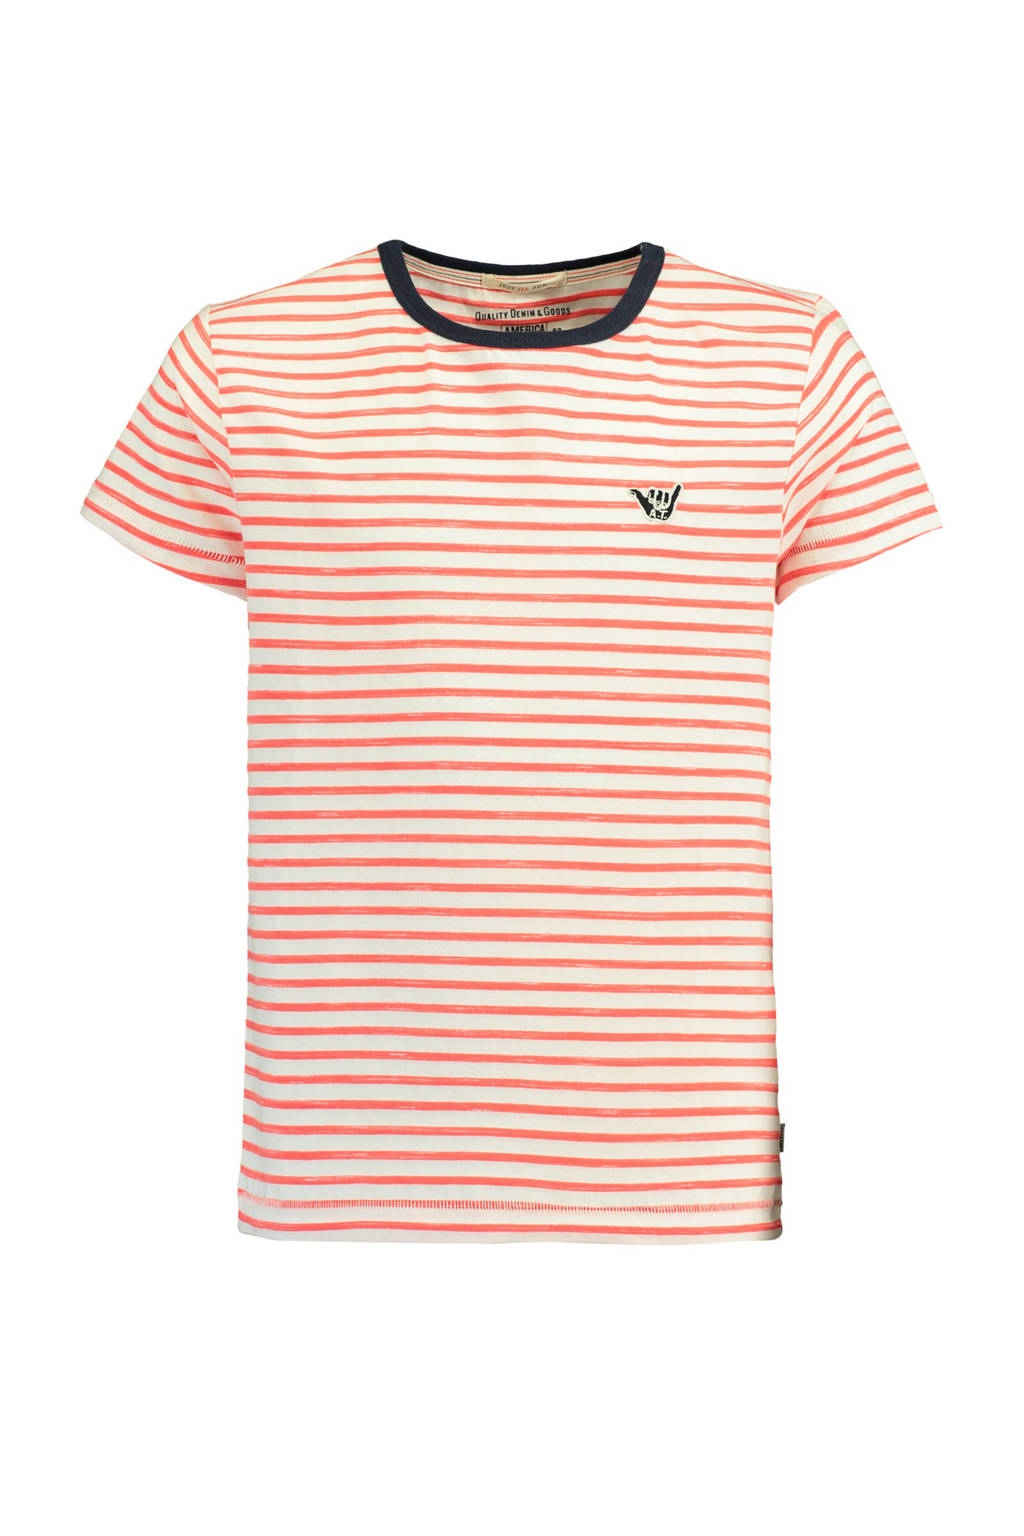 America Today Junior gestreept T-shirt Elias rood, Rood